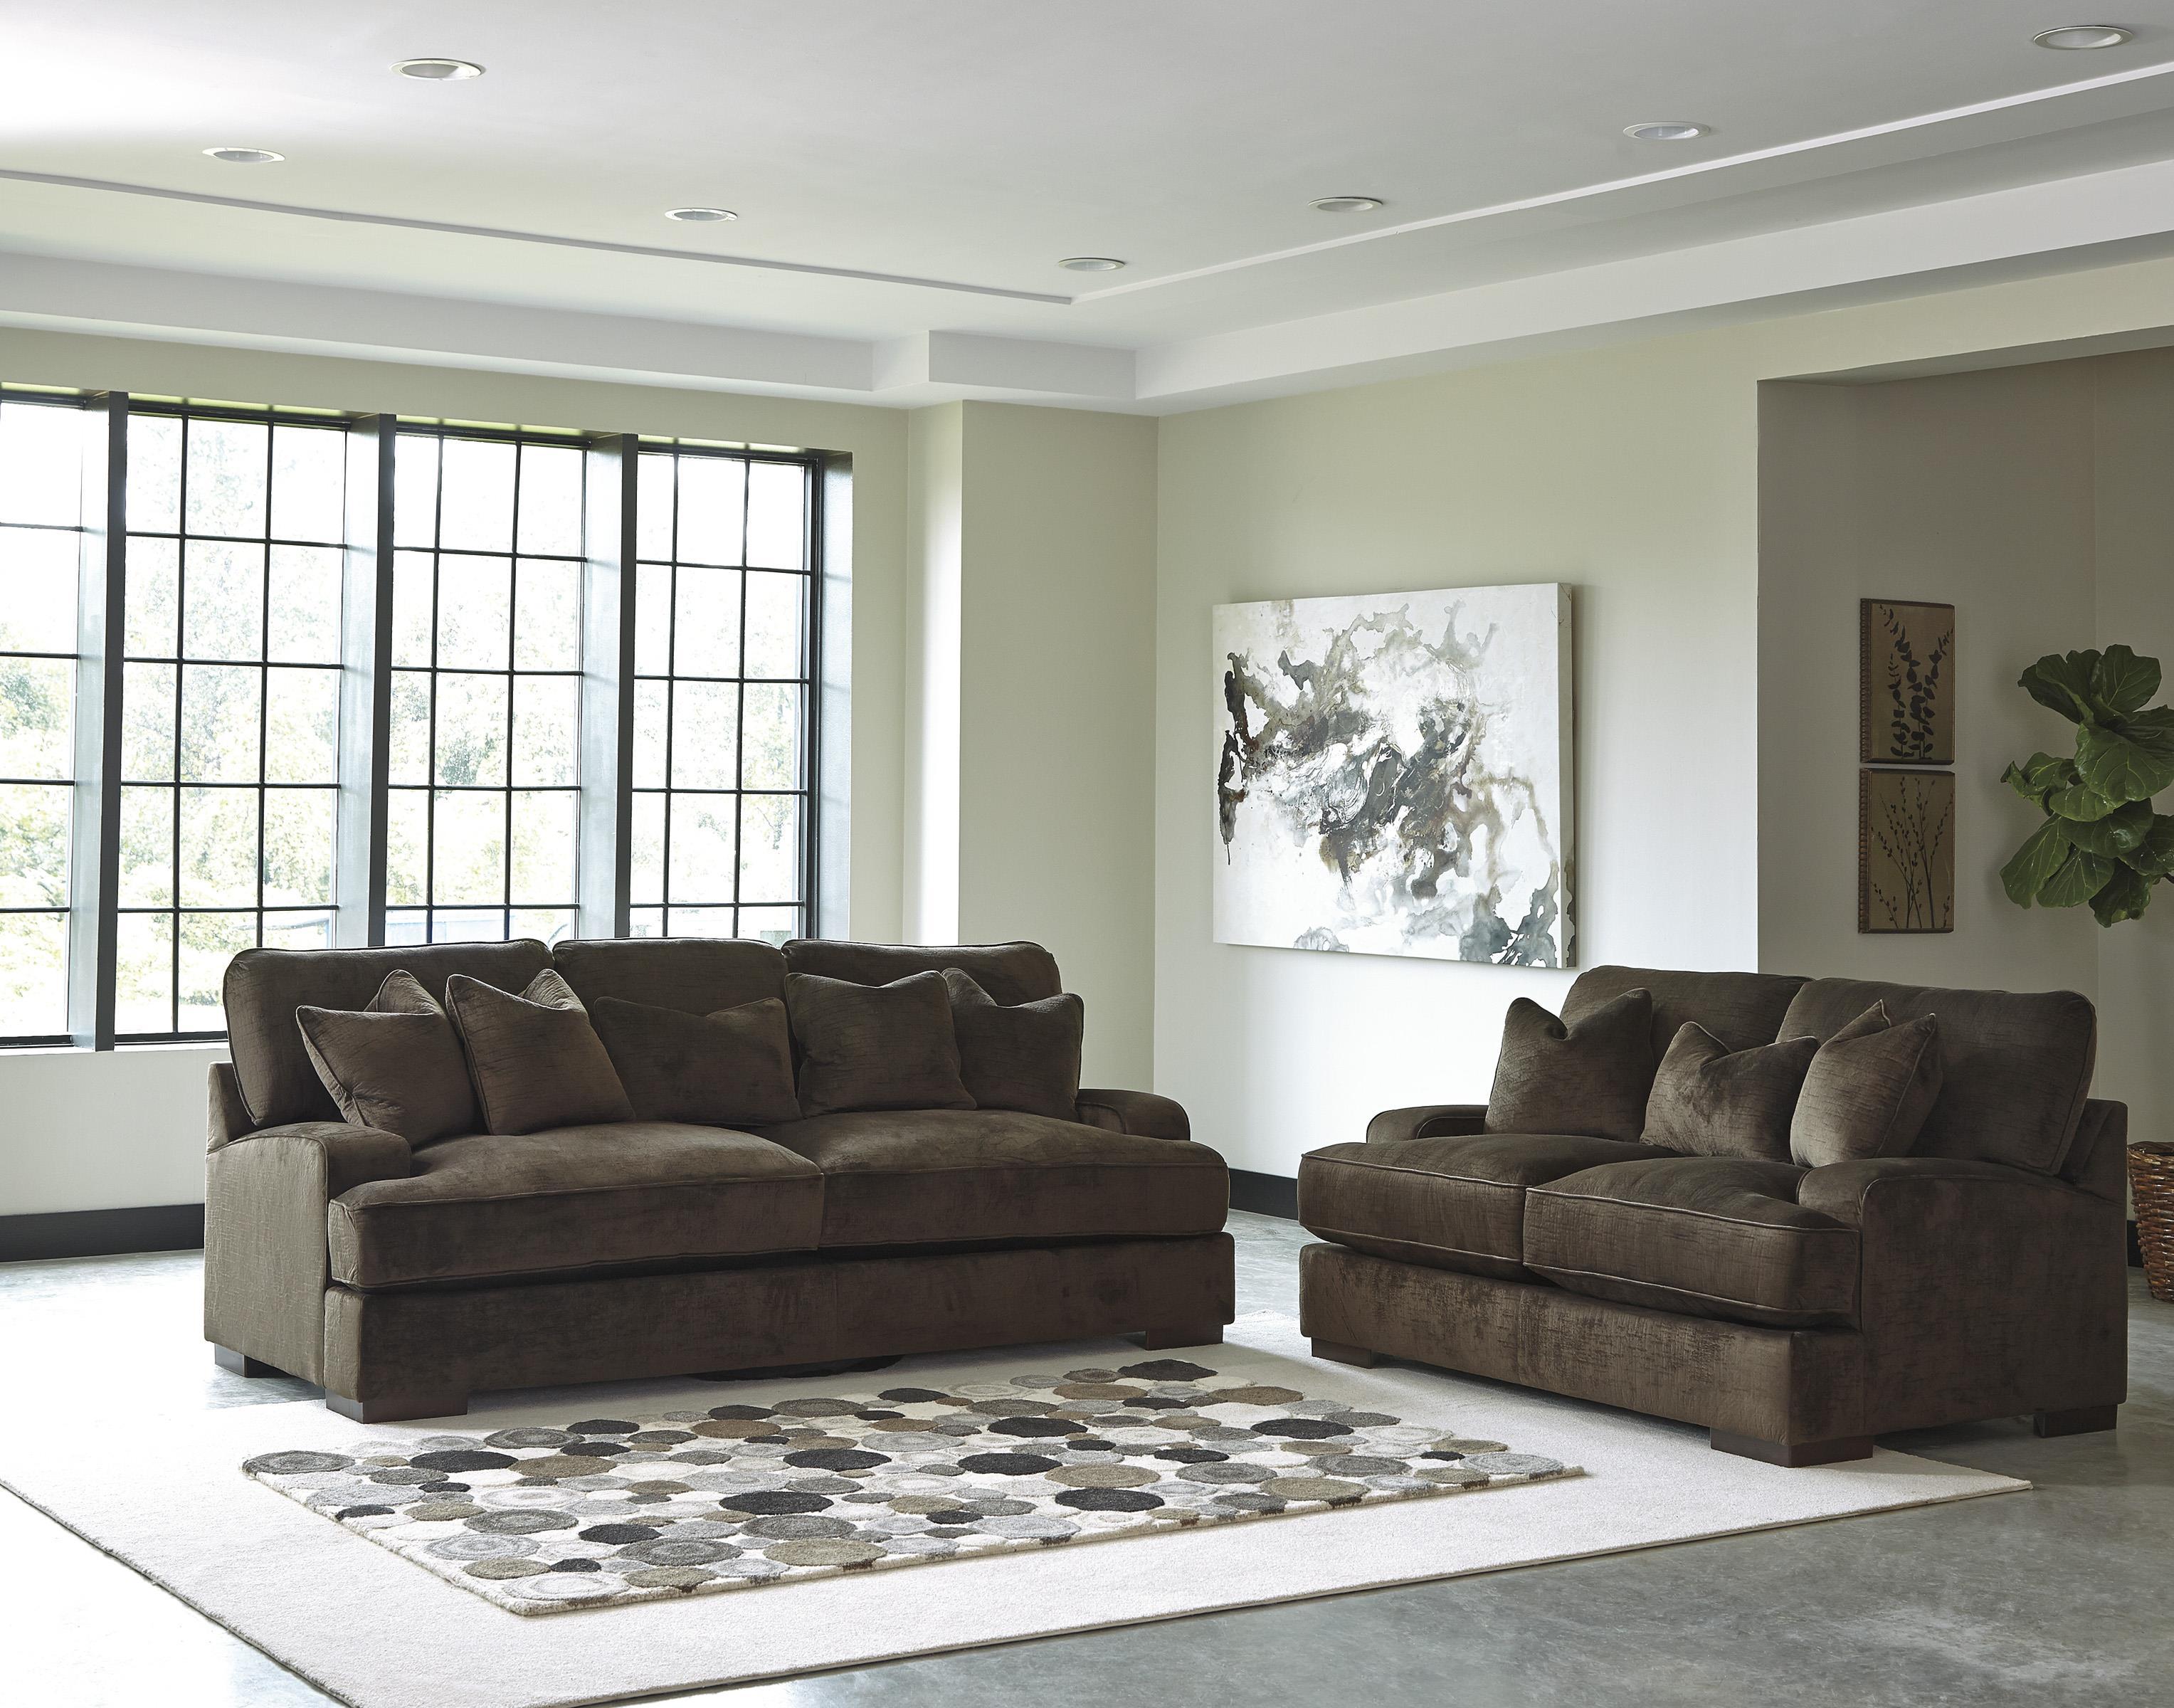 Benchcraft Bisenti Contemporary Sofa with UltraPlush  : products2Fbenchcraft2Fcolor2Fbisenti6530638 b3 from www.dunkandbright.com size 3055 x 2400 jpeg 748kB